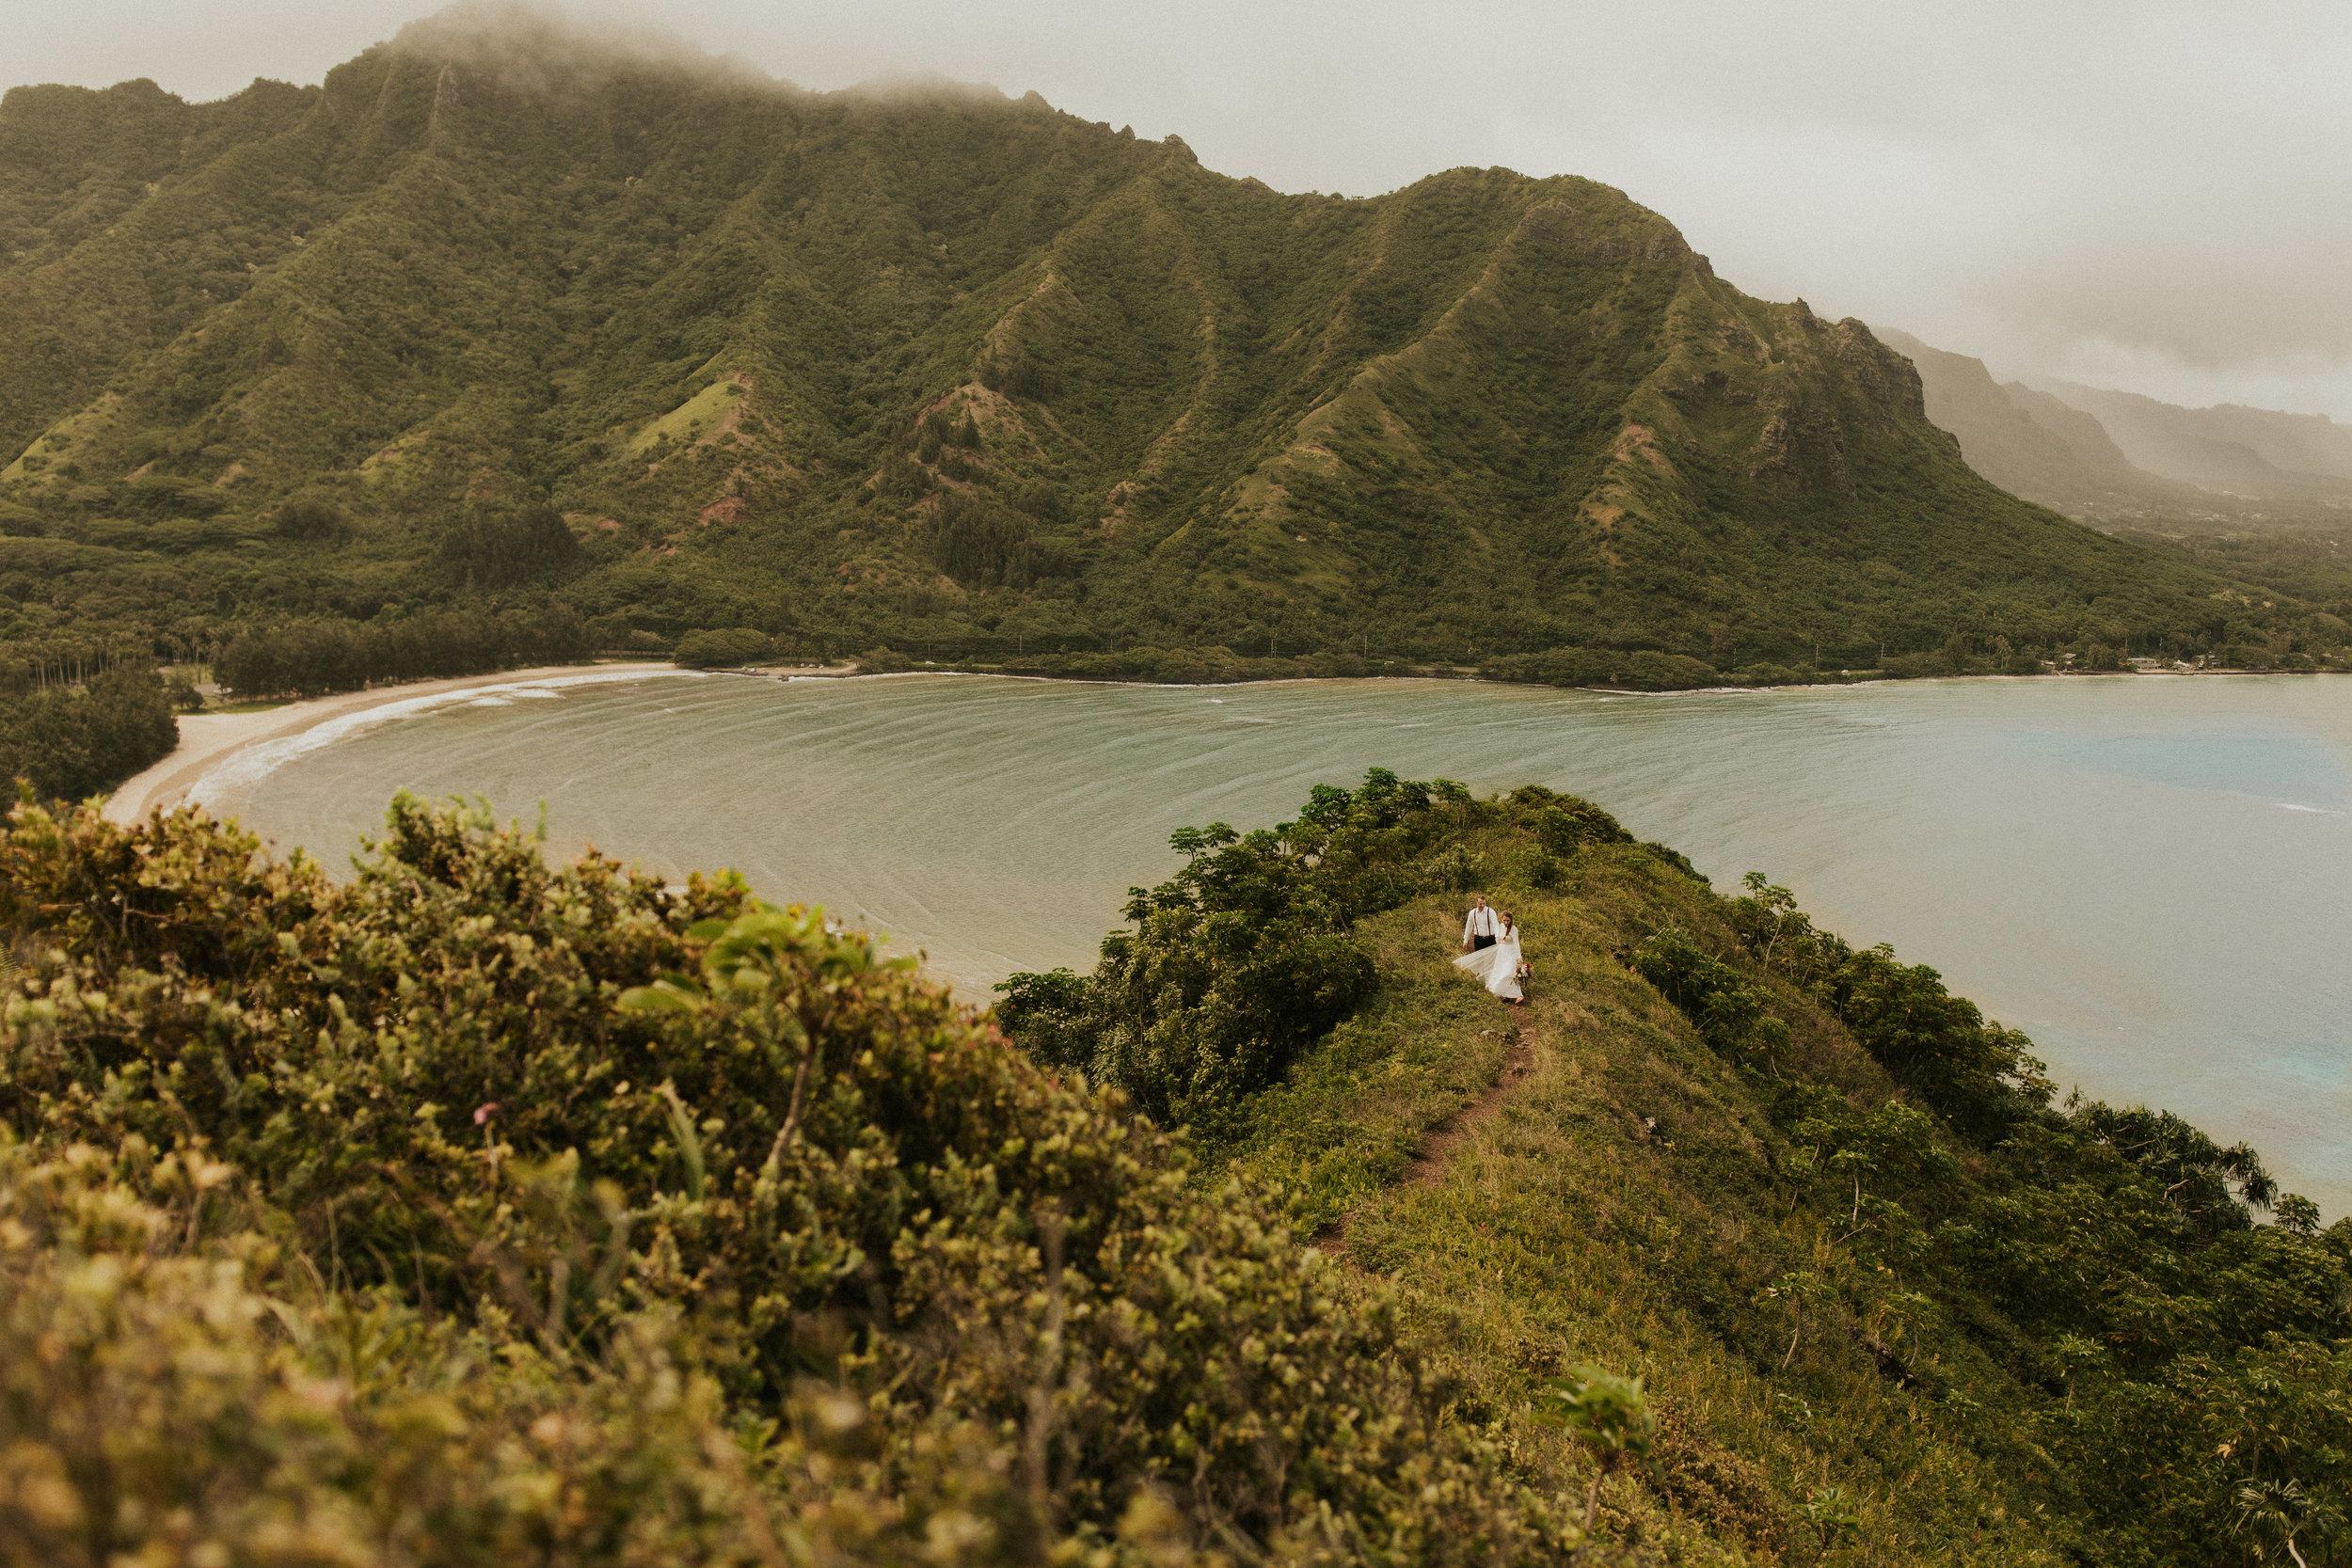 the-mclachlans-destination-elopement-photographers-mountain-hike-sena-eric-107.jpg